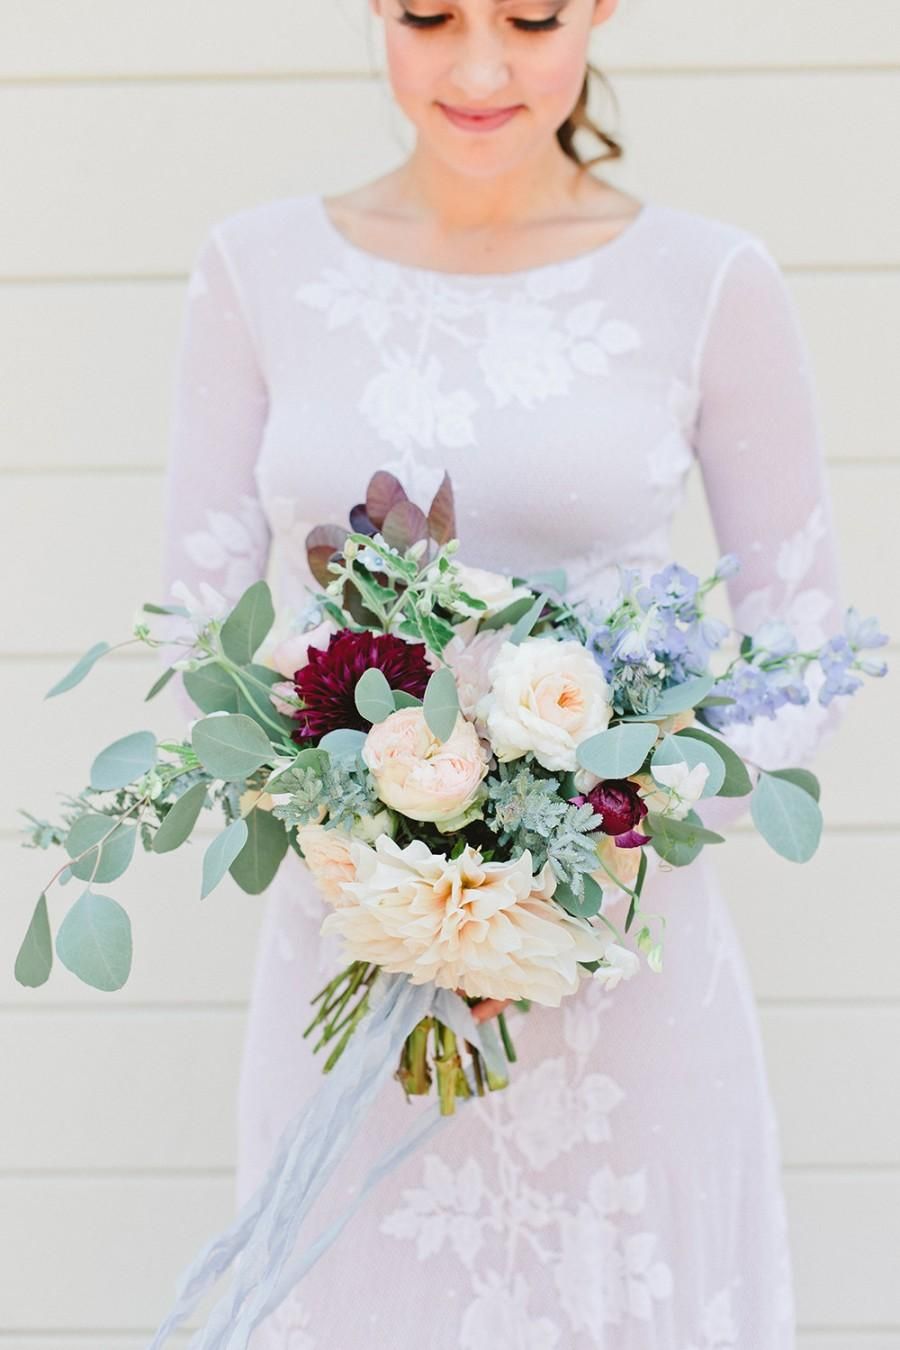 Mariage - Long Sleeve Boho Wedding Dress, Boho Wedding Dress, Lace Wedding Dress, Simple Wedding Dress - Senia Dress